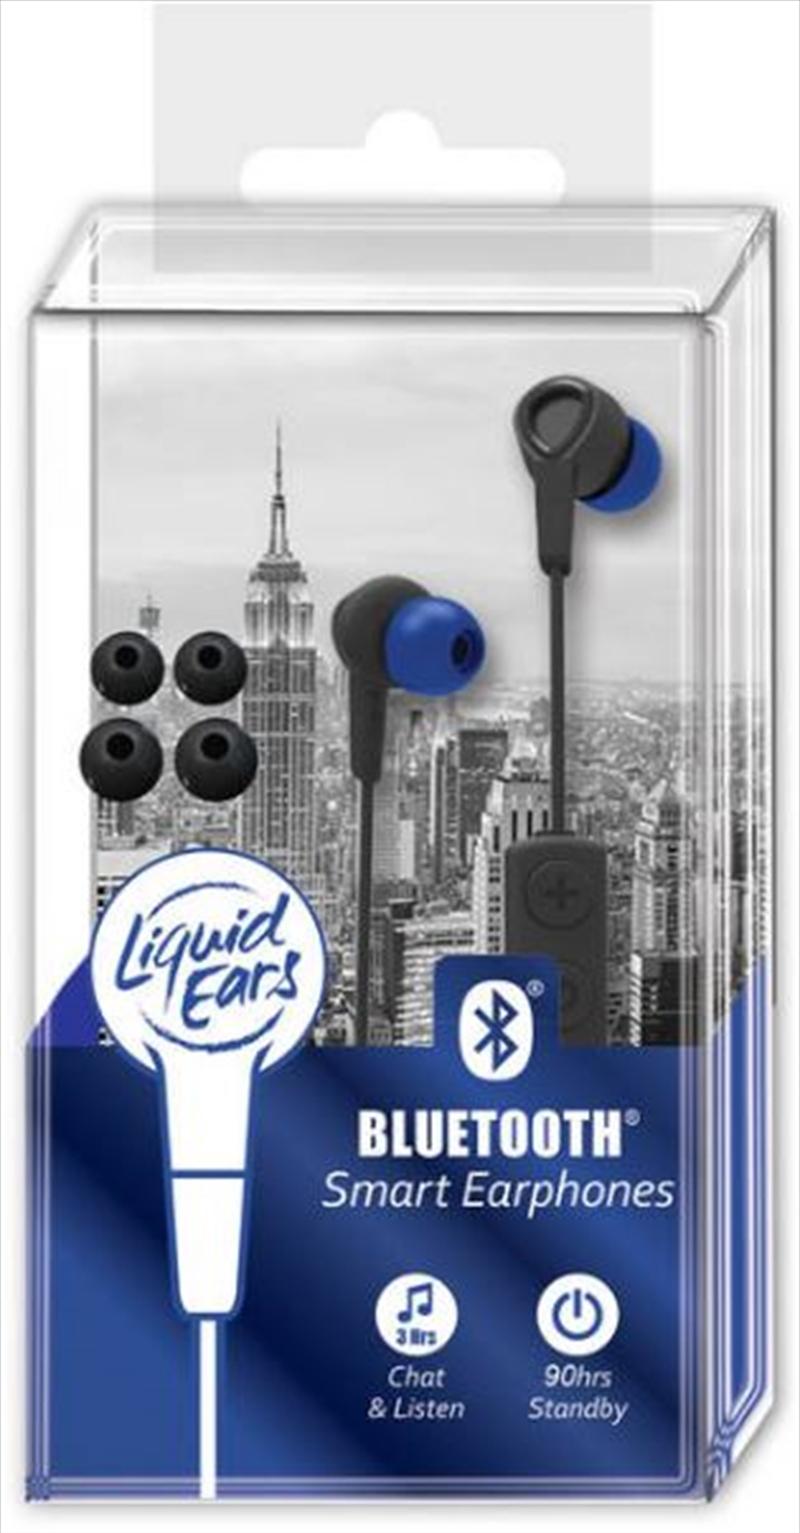 Liquid Ears - Bluetooth Smart Earphones Black/Blue | Accessories